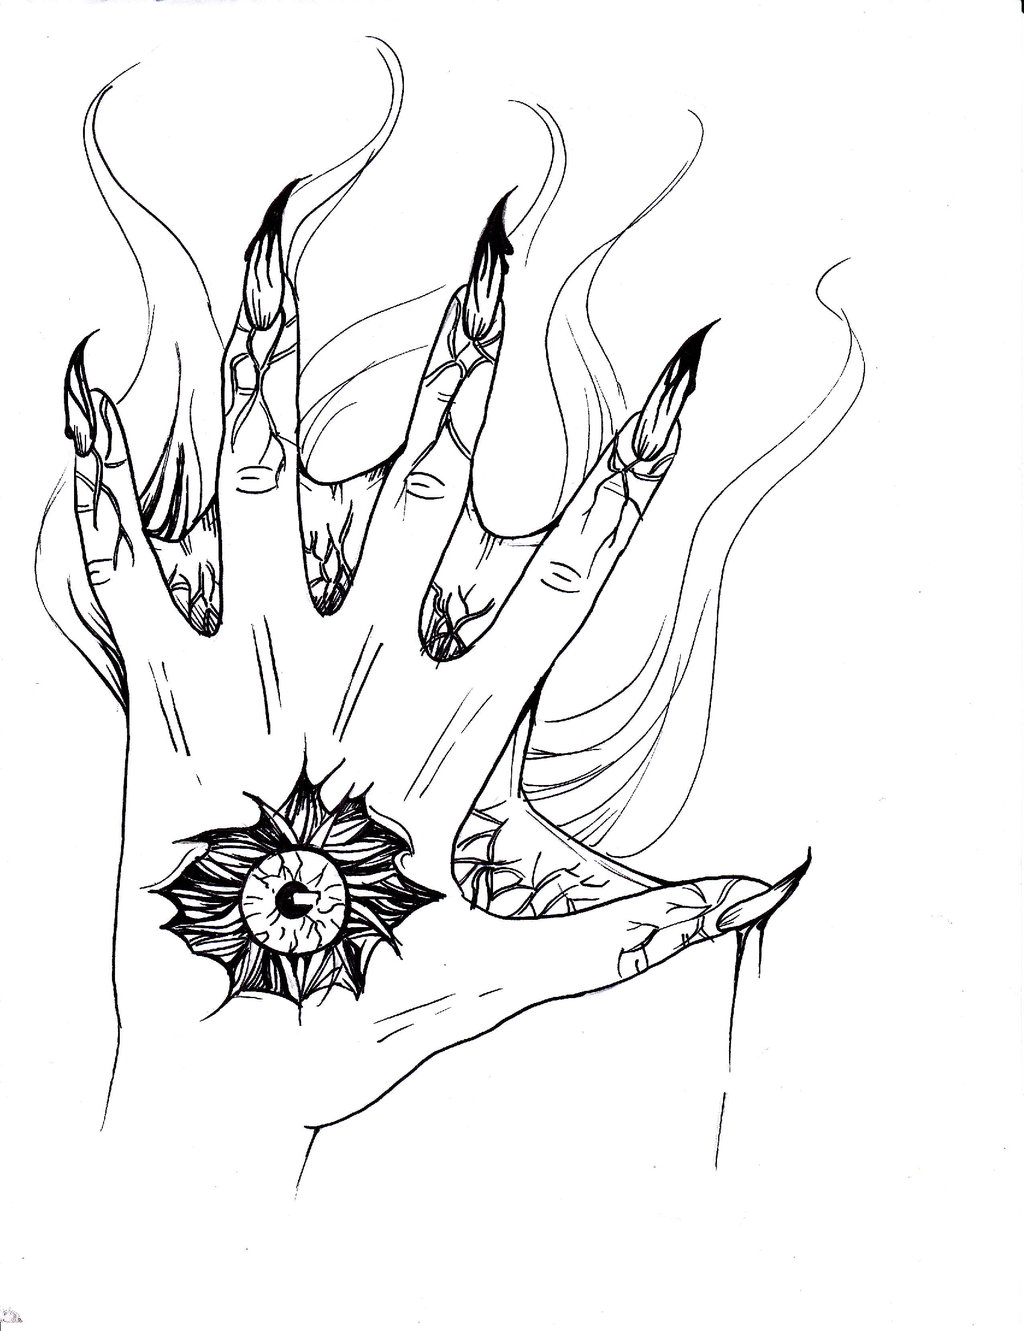 1024x1331 A Creepy Hand Drawing By Deepseastar